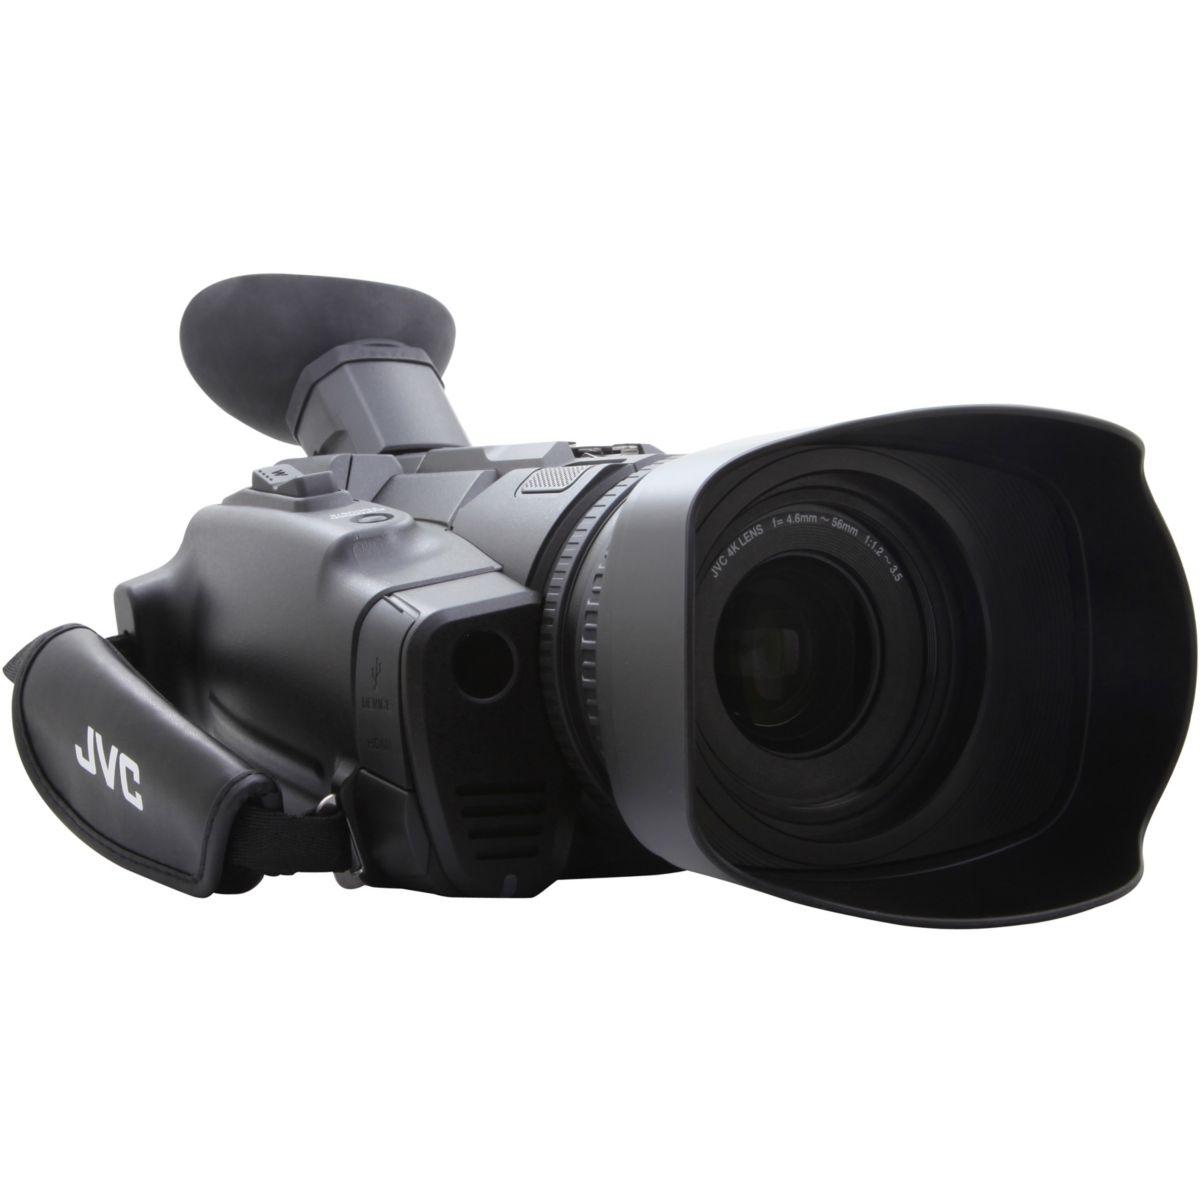 Caméscope 4K JVC GY-HM170E